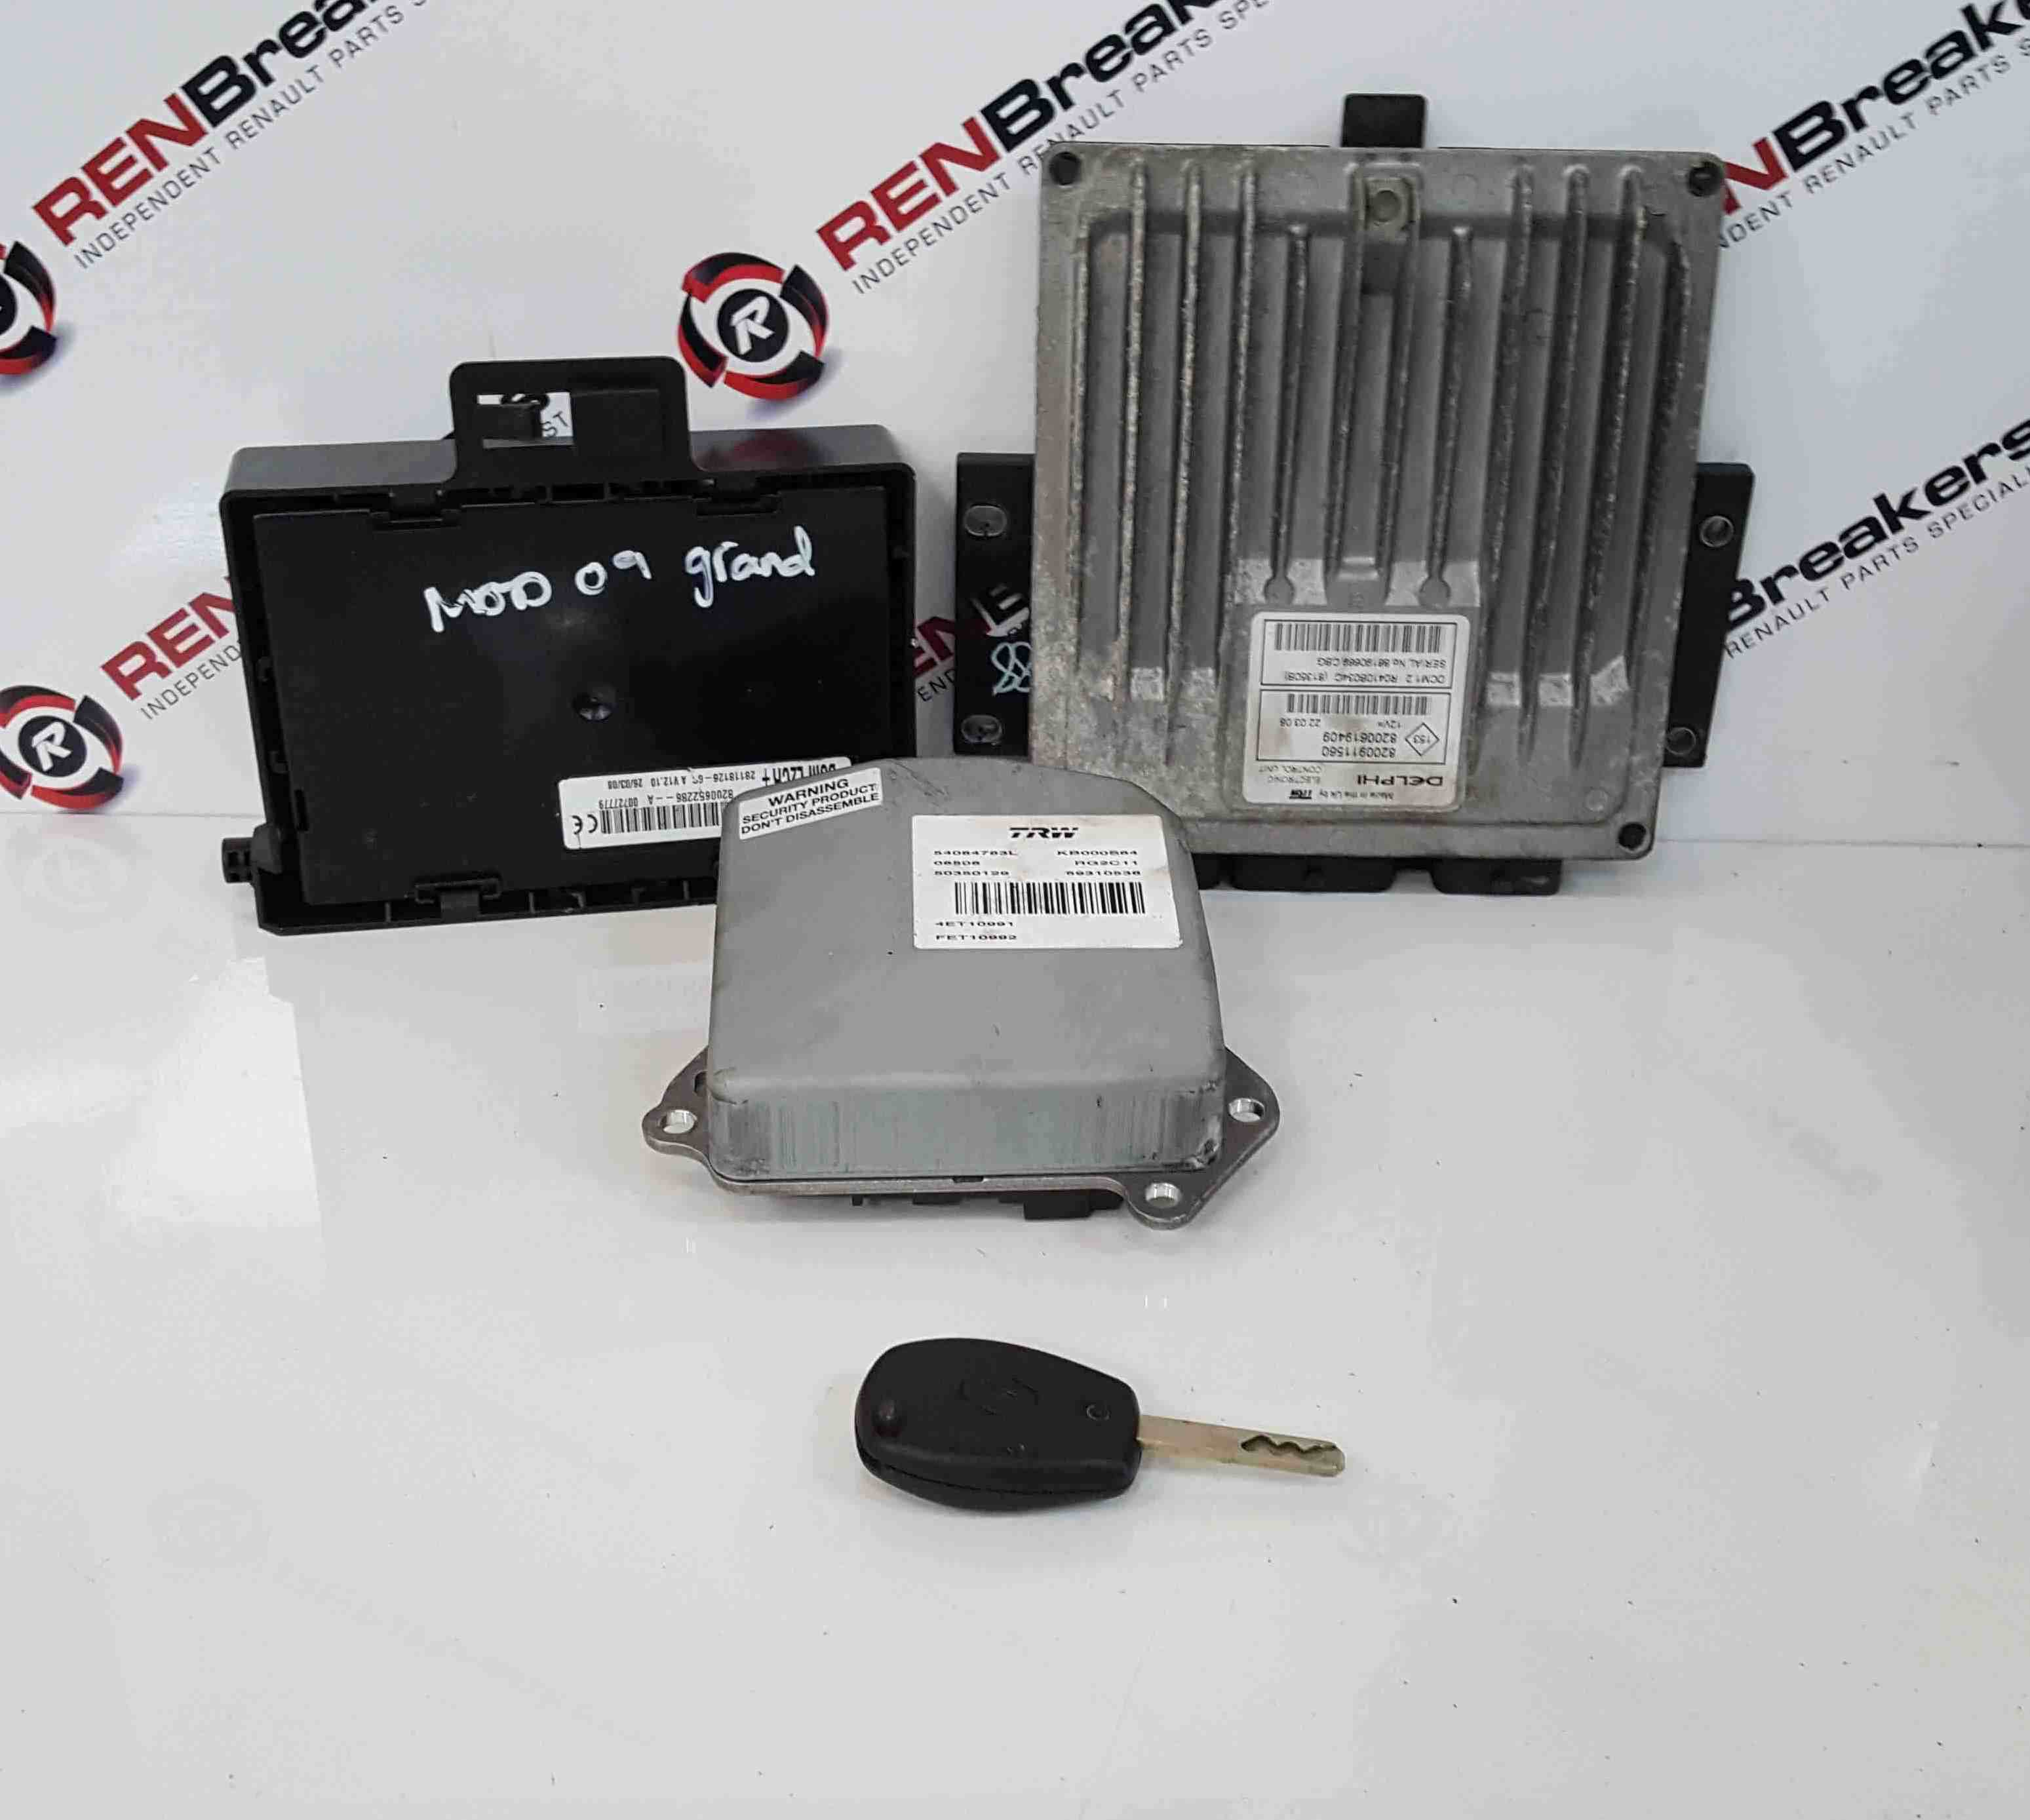 Renault Grand Modus 2008-2012 1.5 DCi ECU SET UCH BCM Immobiliser + Key Fob